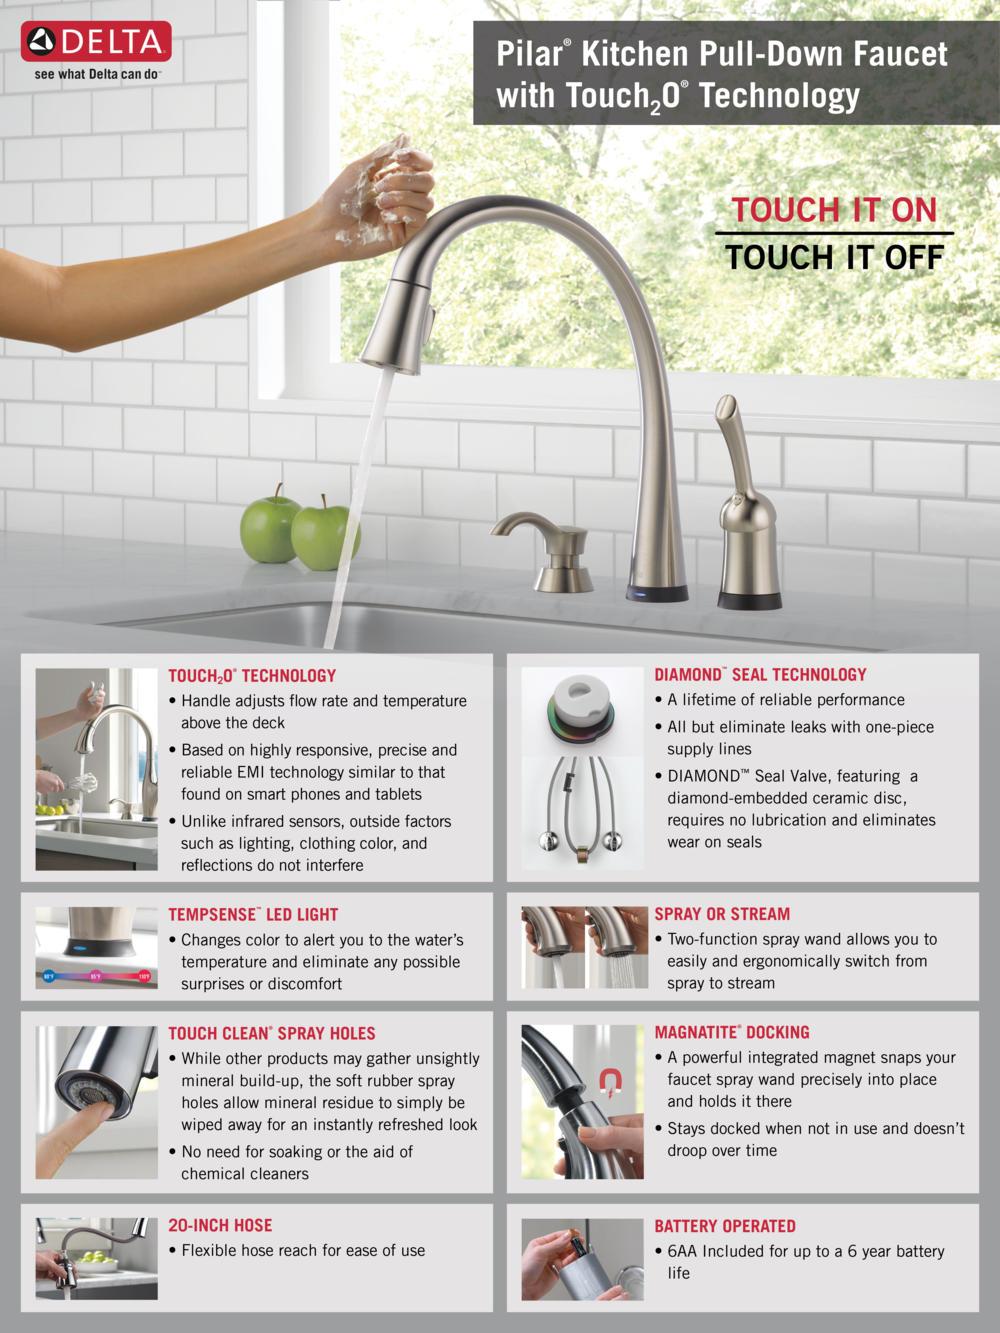 delta touch kitchen faucet Home Depot Delta Faucet Touch2OKitchen Infographic